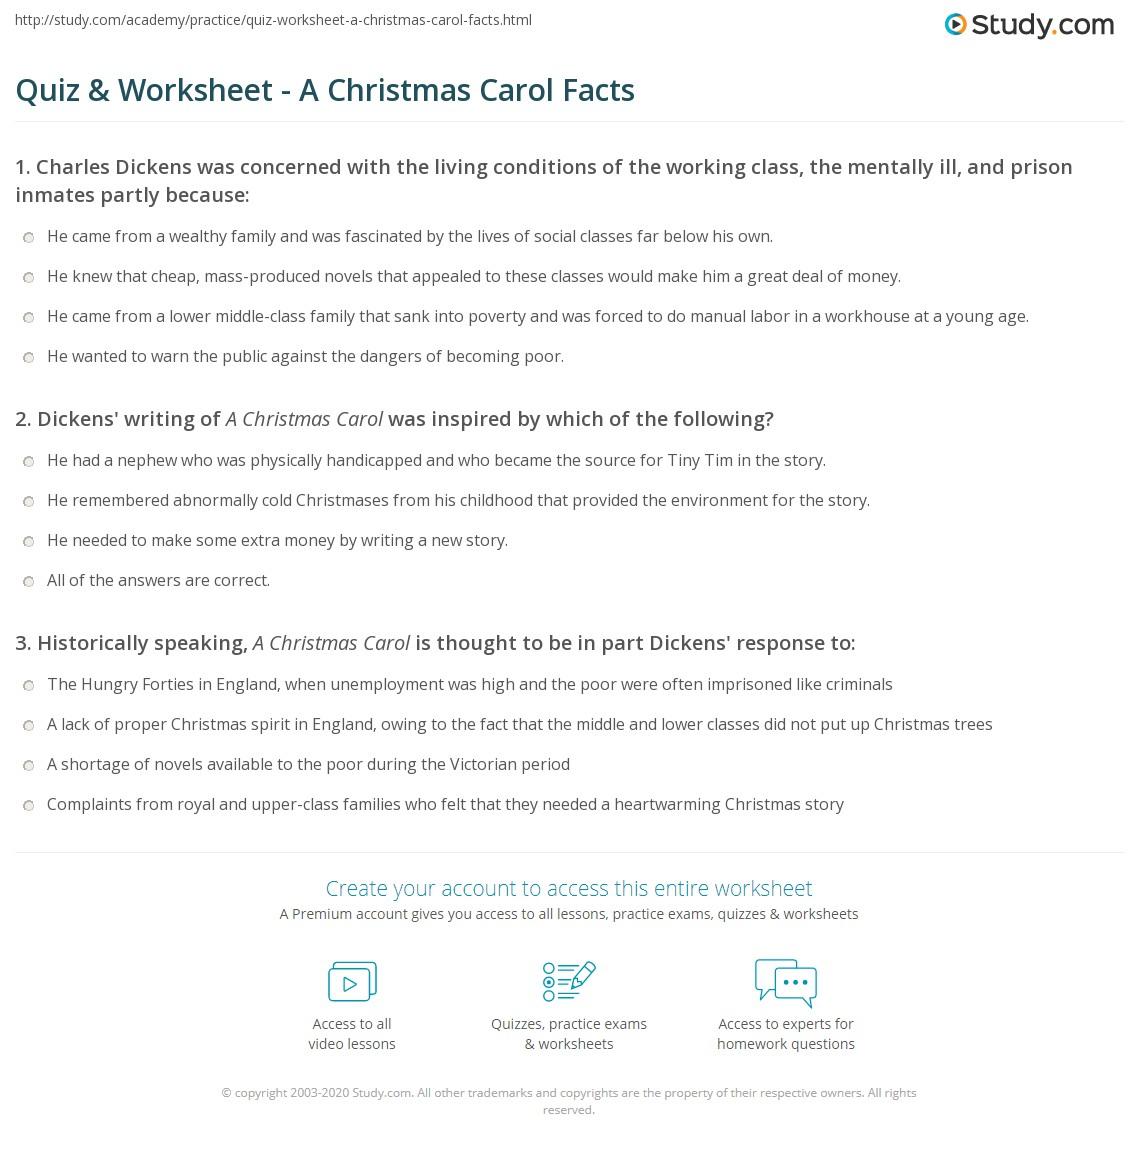 Quiz & Worksheet - A Christmas Carol Facts | Study